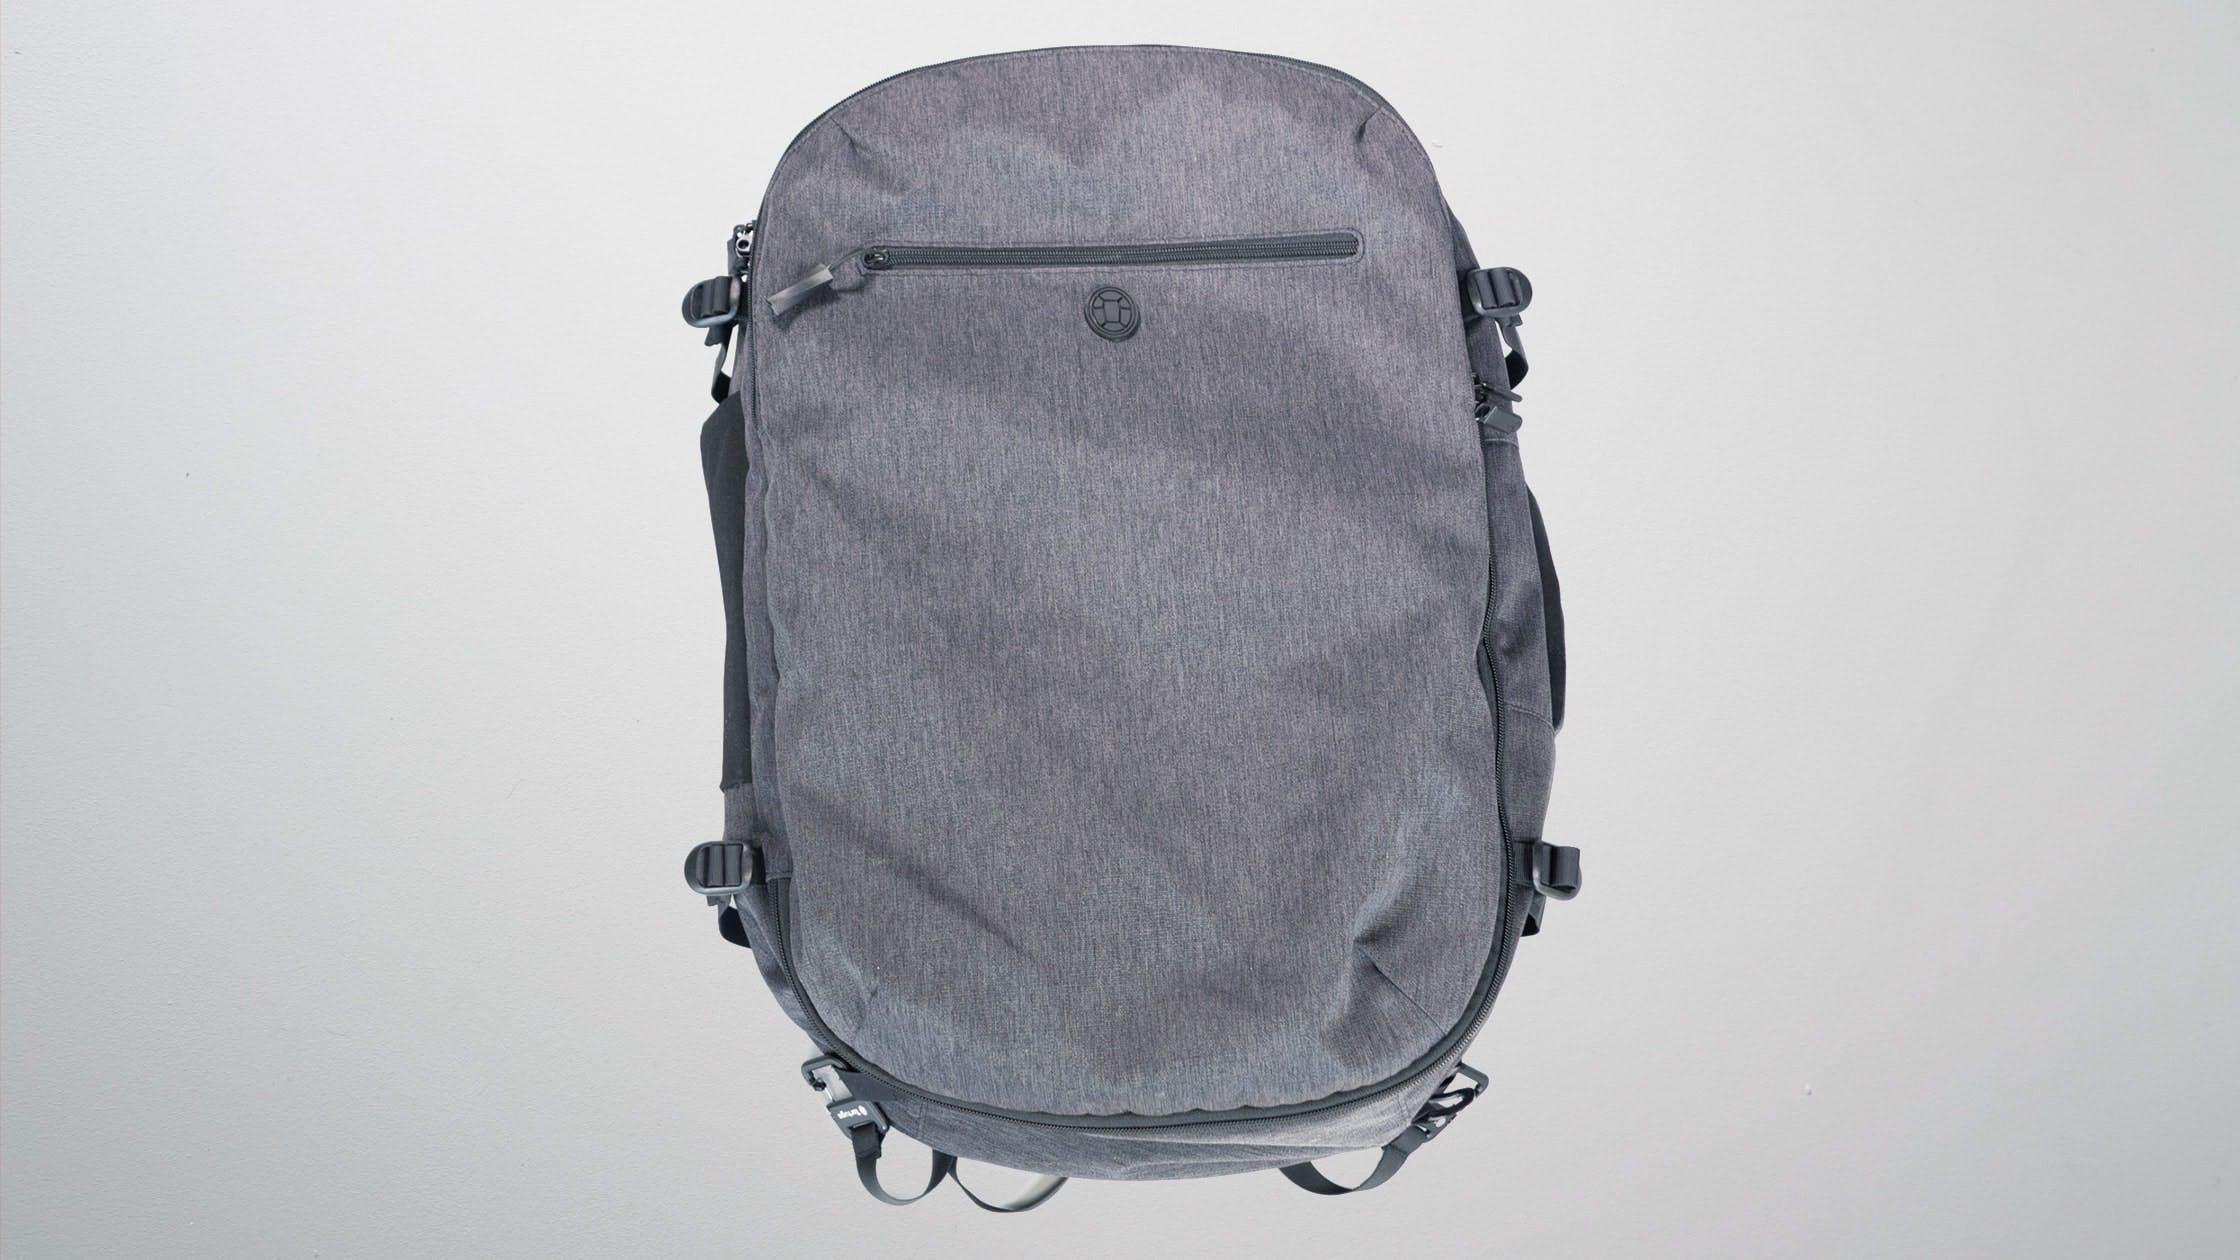 7e47c19ade7f Tortuga Setout Backpack Review (Travel)